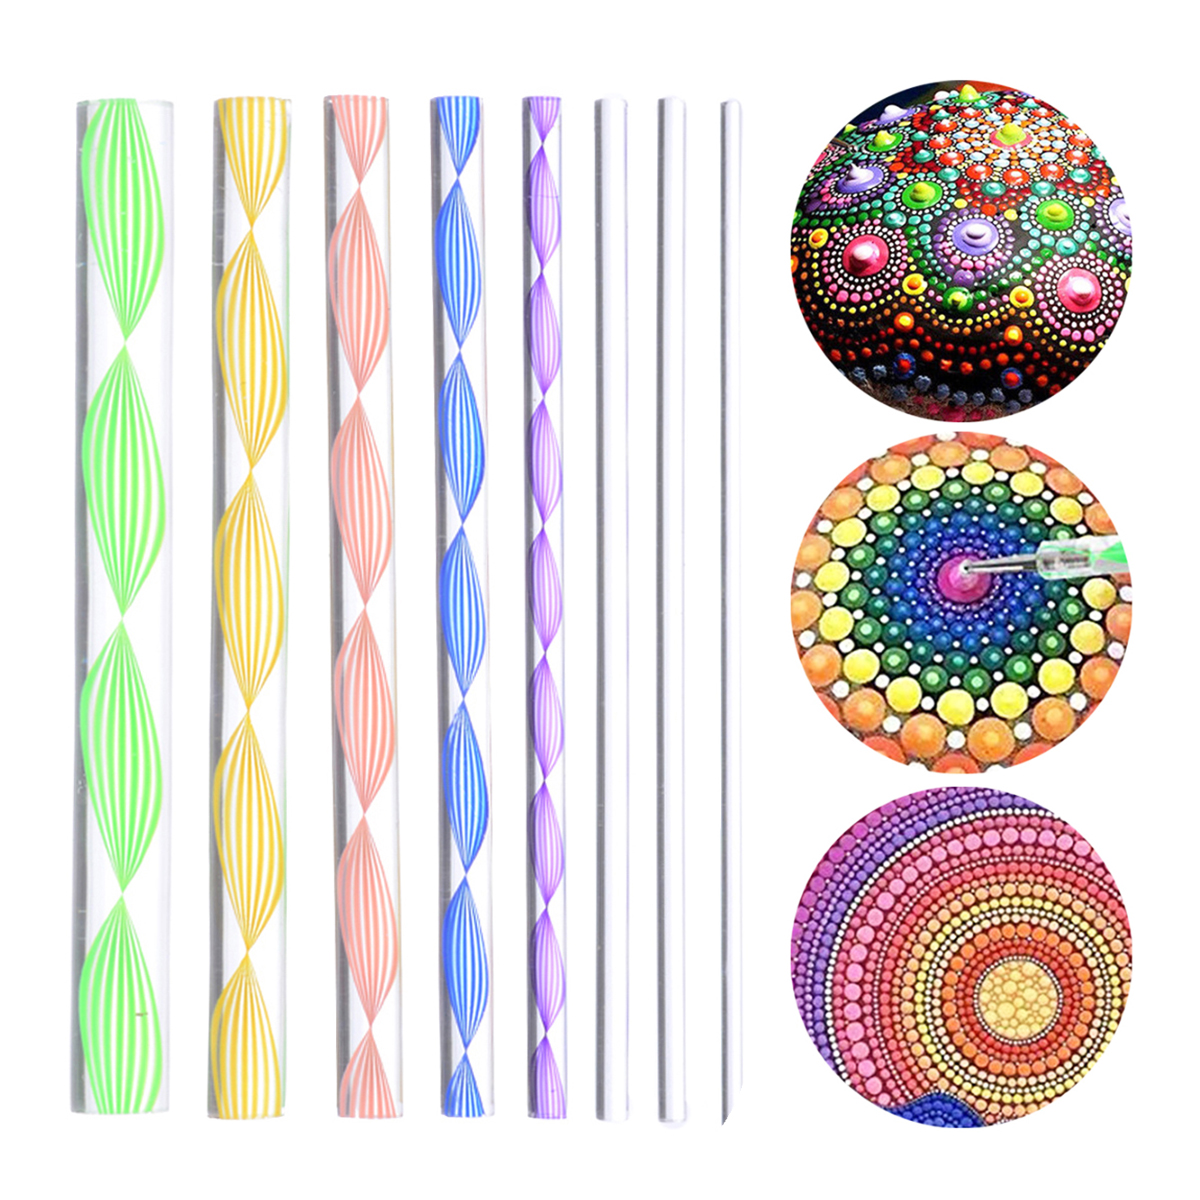 Pottery & Ceramics 8pcs/et Mandala Dotting Tools Painting Stencils Rocks Template Set Rods Ball Stylus Painting Pottery Clay Craft Nail Art Tools Reliable Performance